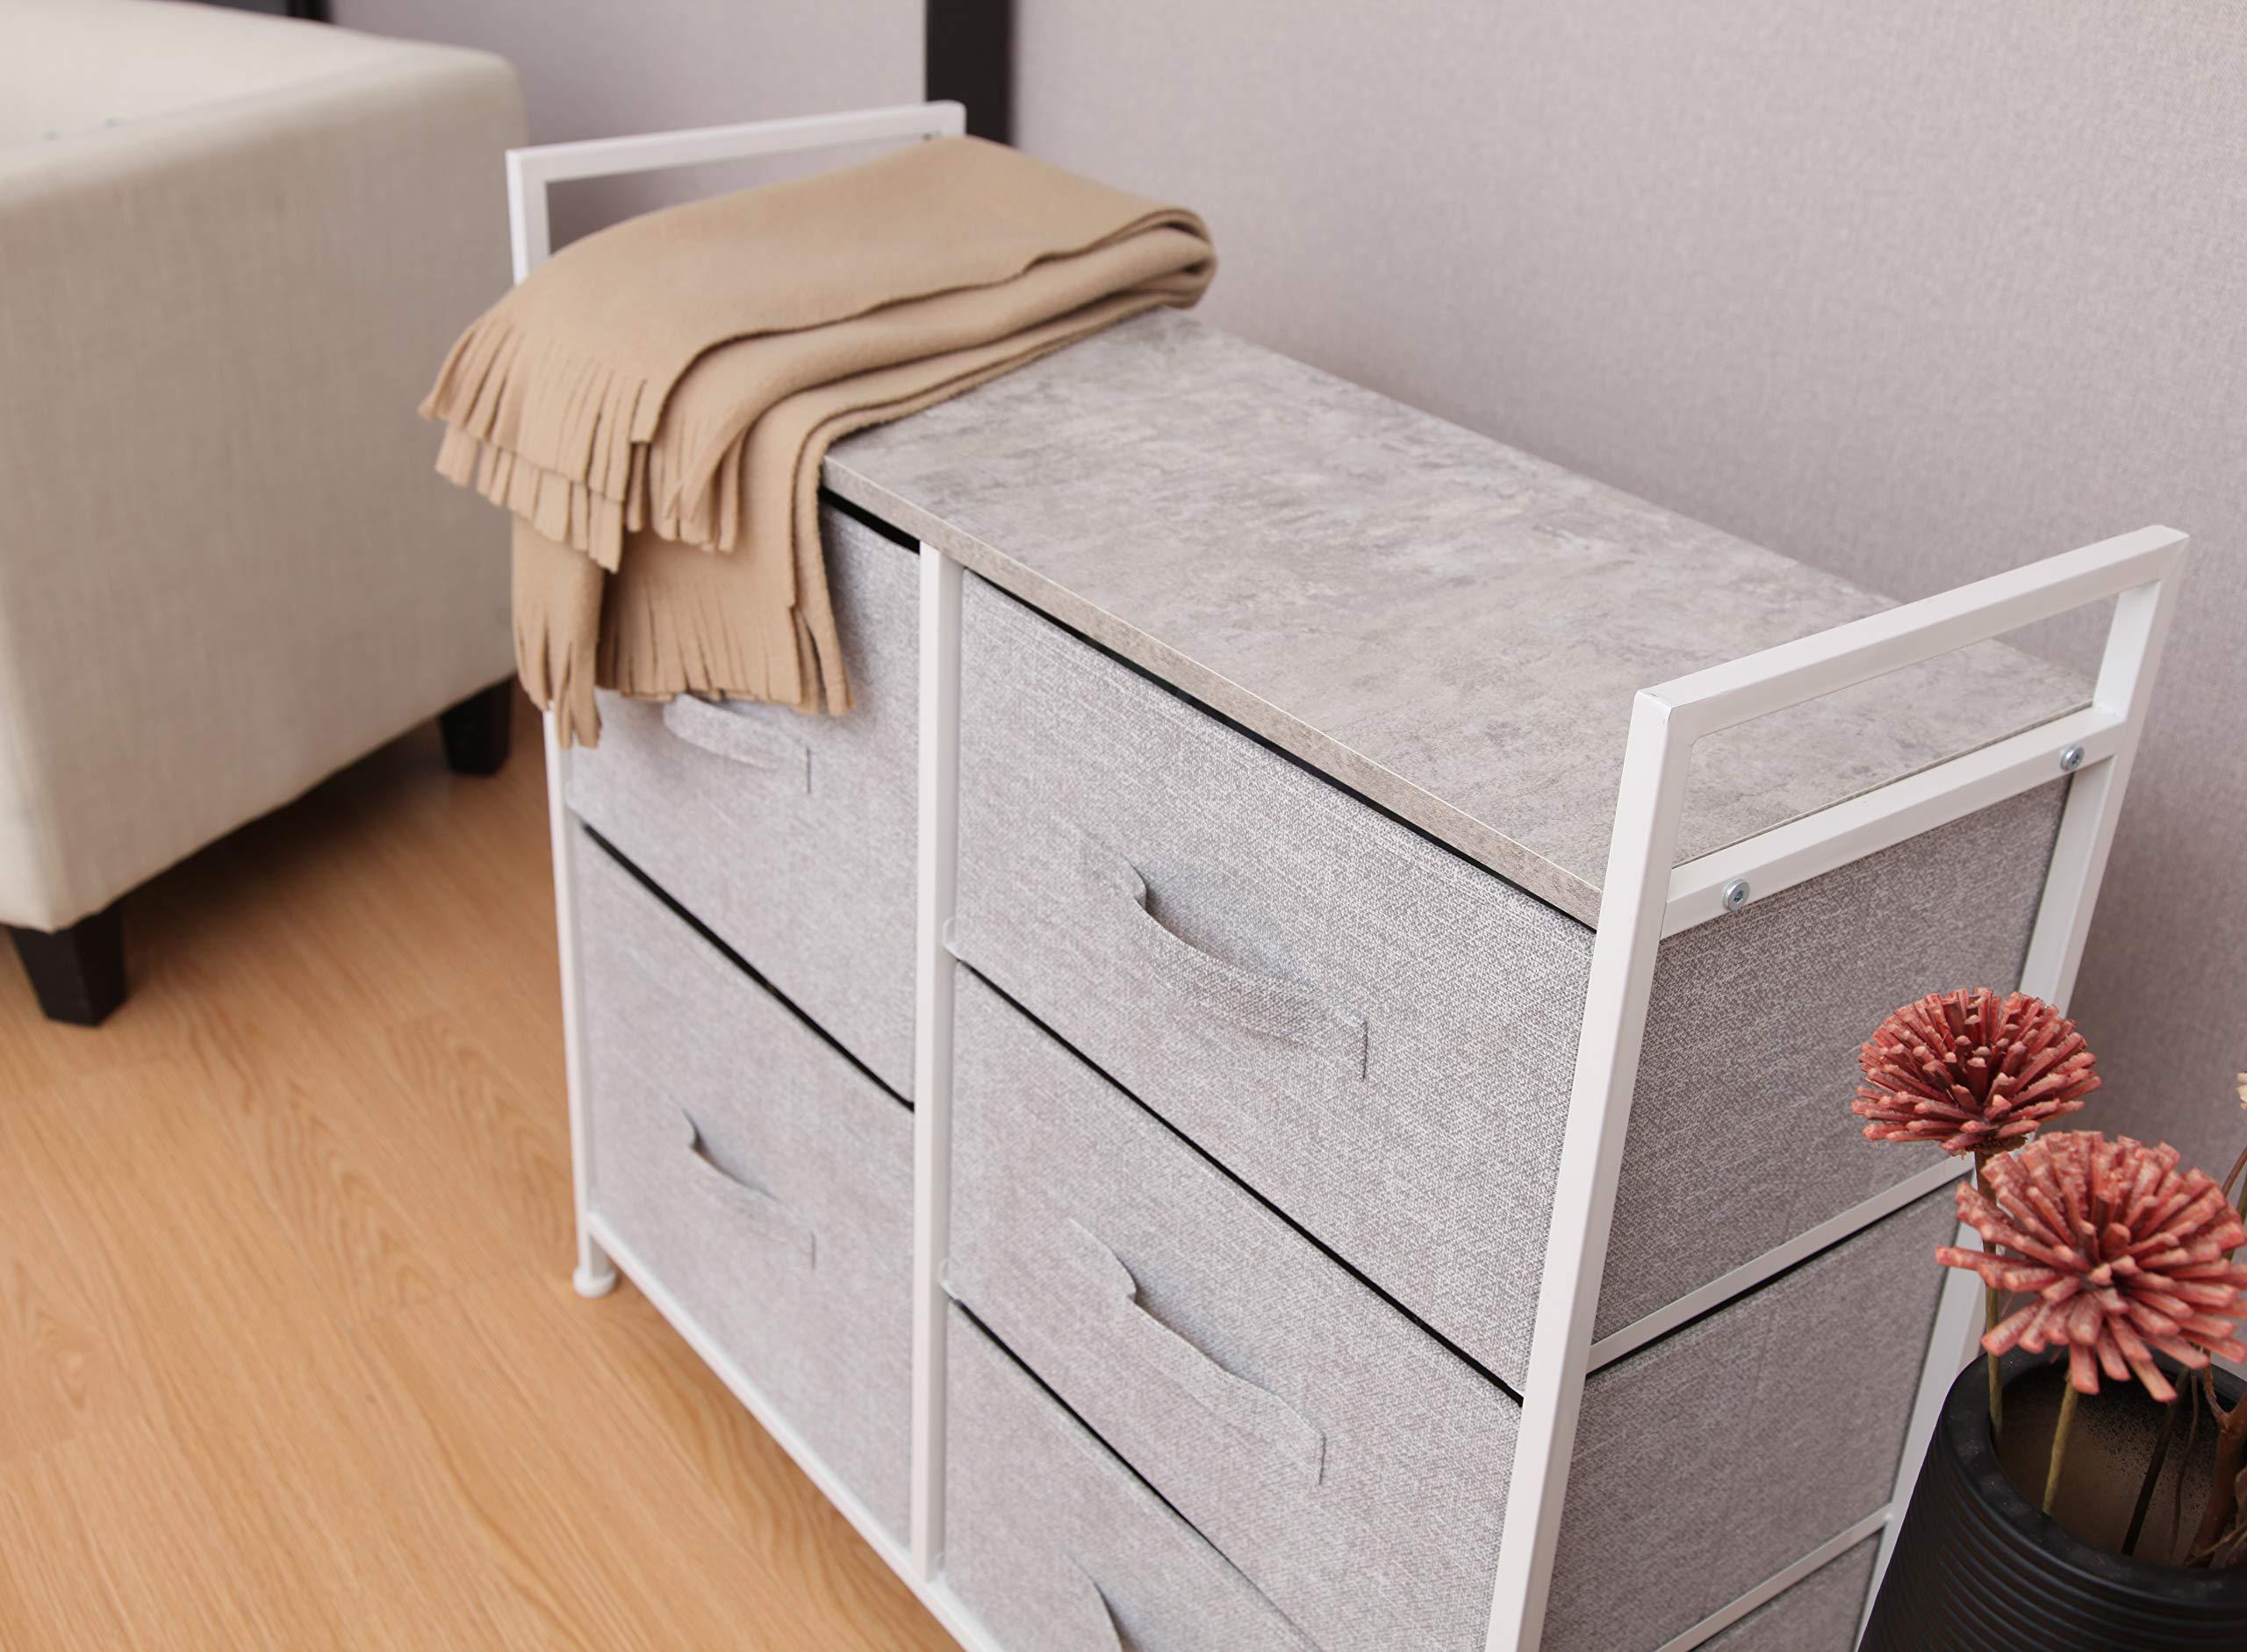 East Loft Storage Cube Dresser | Organizer for Closet, Nursery, Bathroom, Laundry or Bedroom | 5 Fabric Drawers, Solid Wood Top, Durable Steel Frame | Light Grey by East Loft